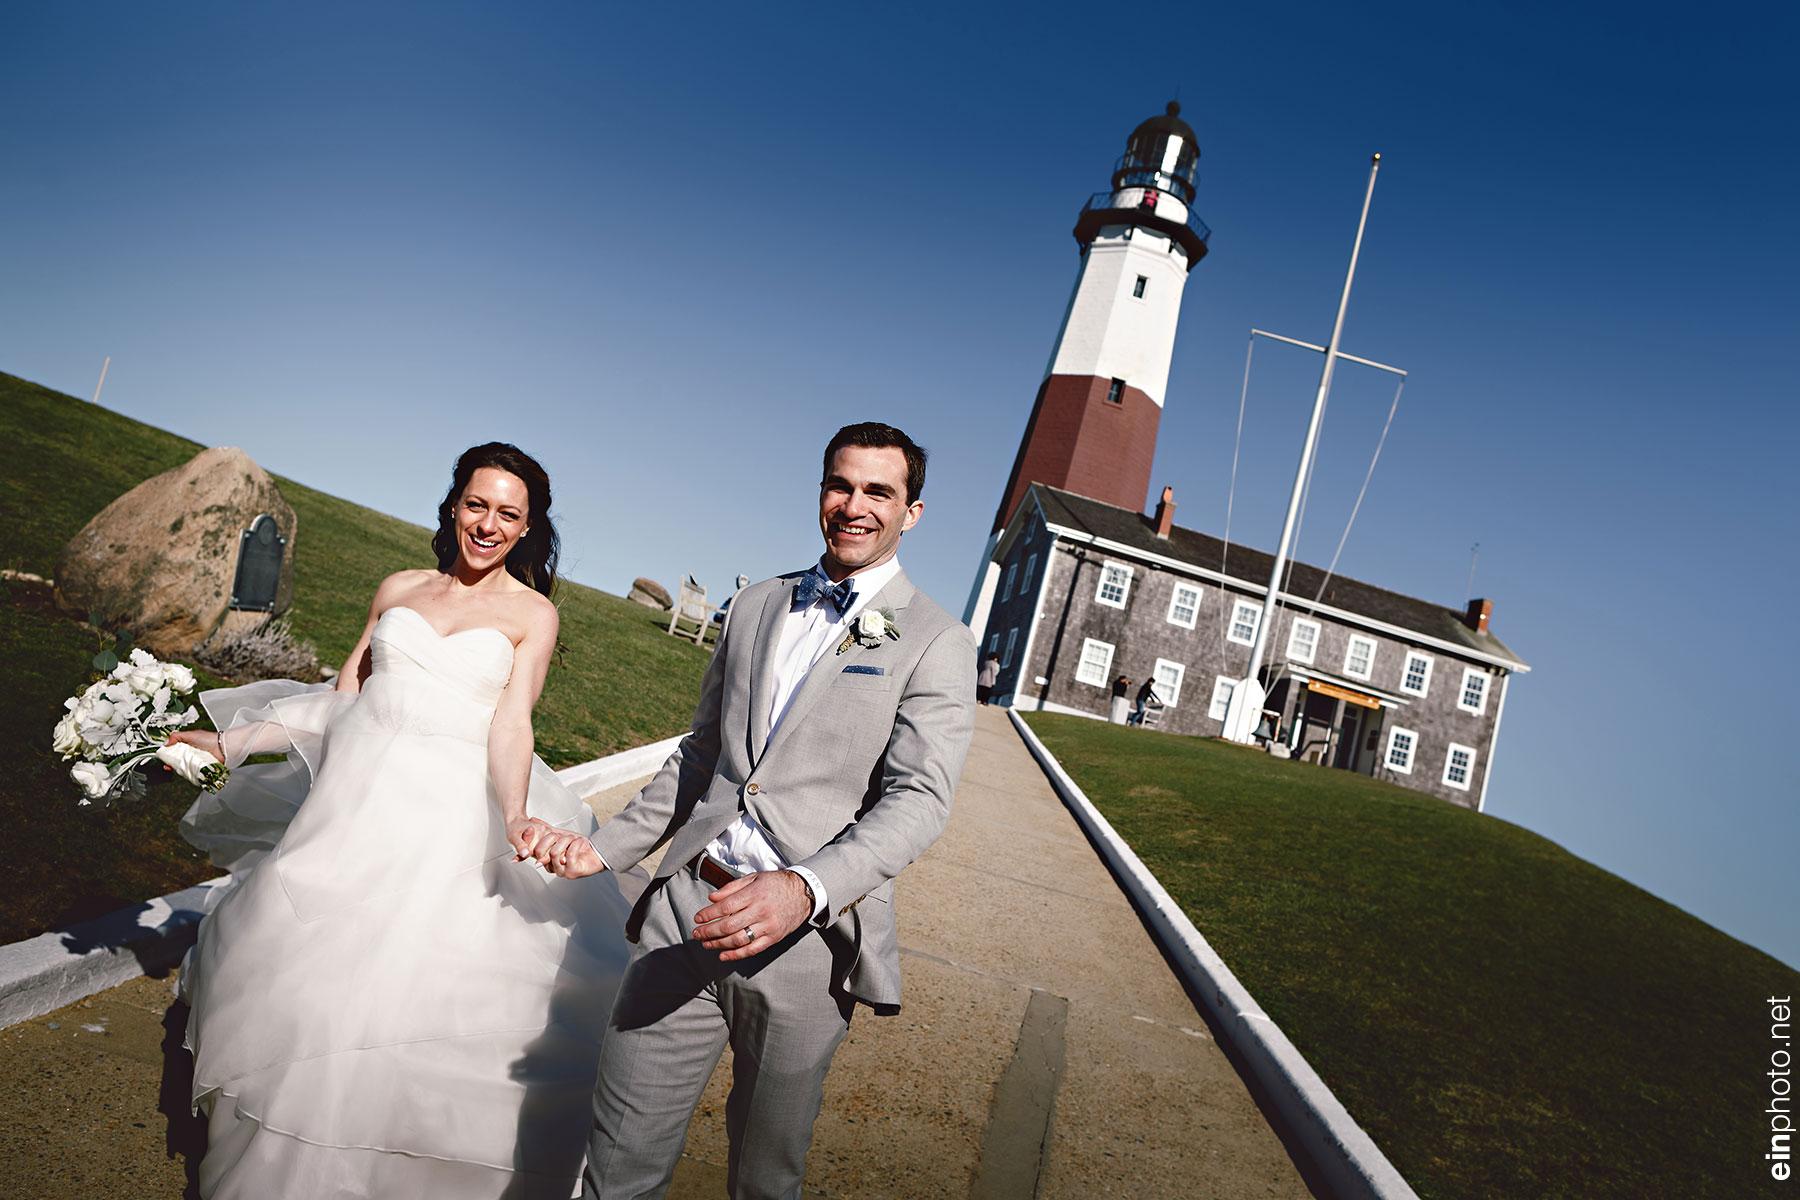 gurneys-montauk-wedding-0036.jpg